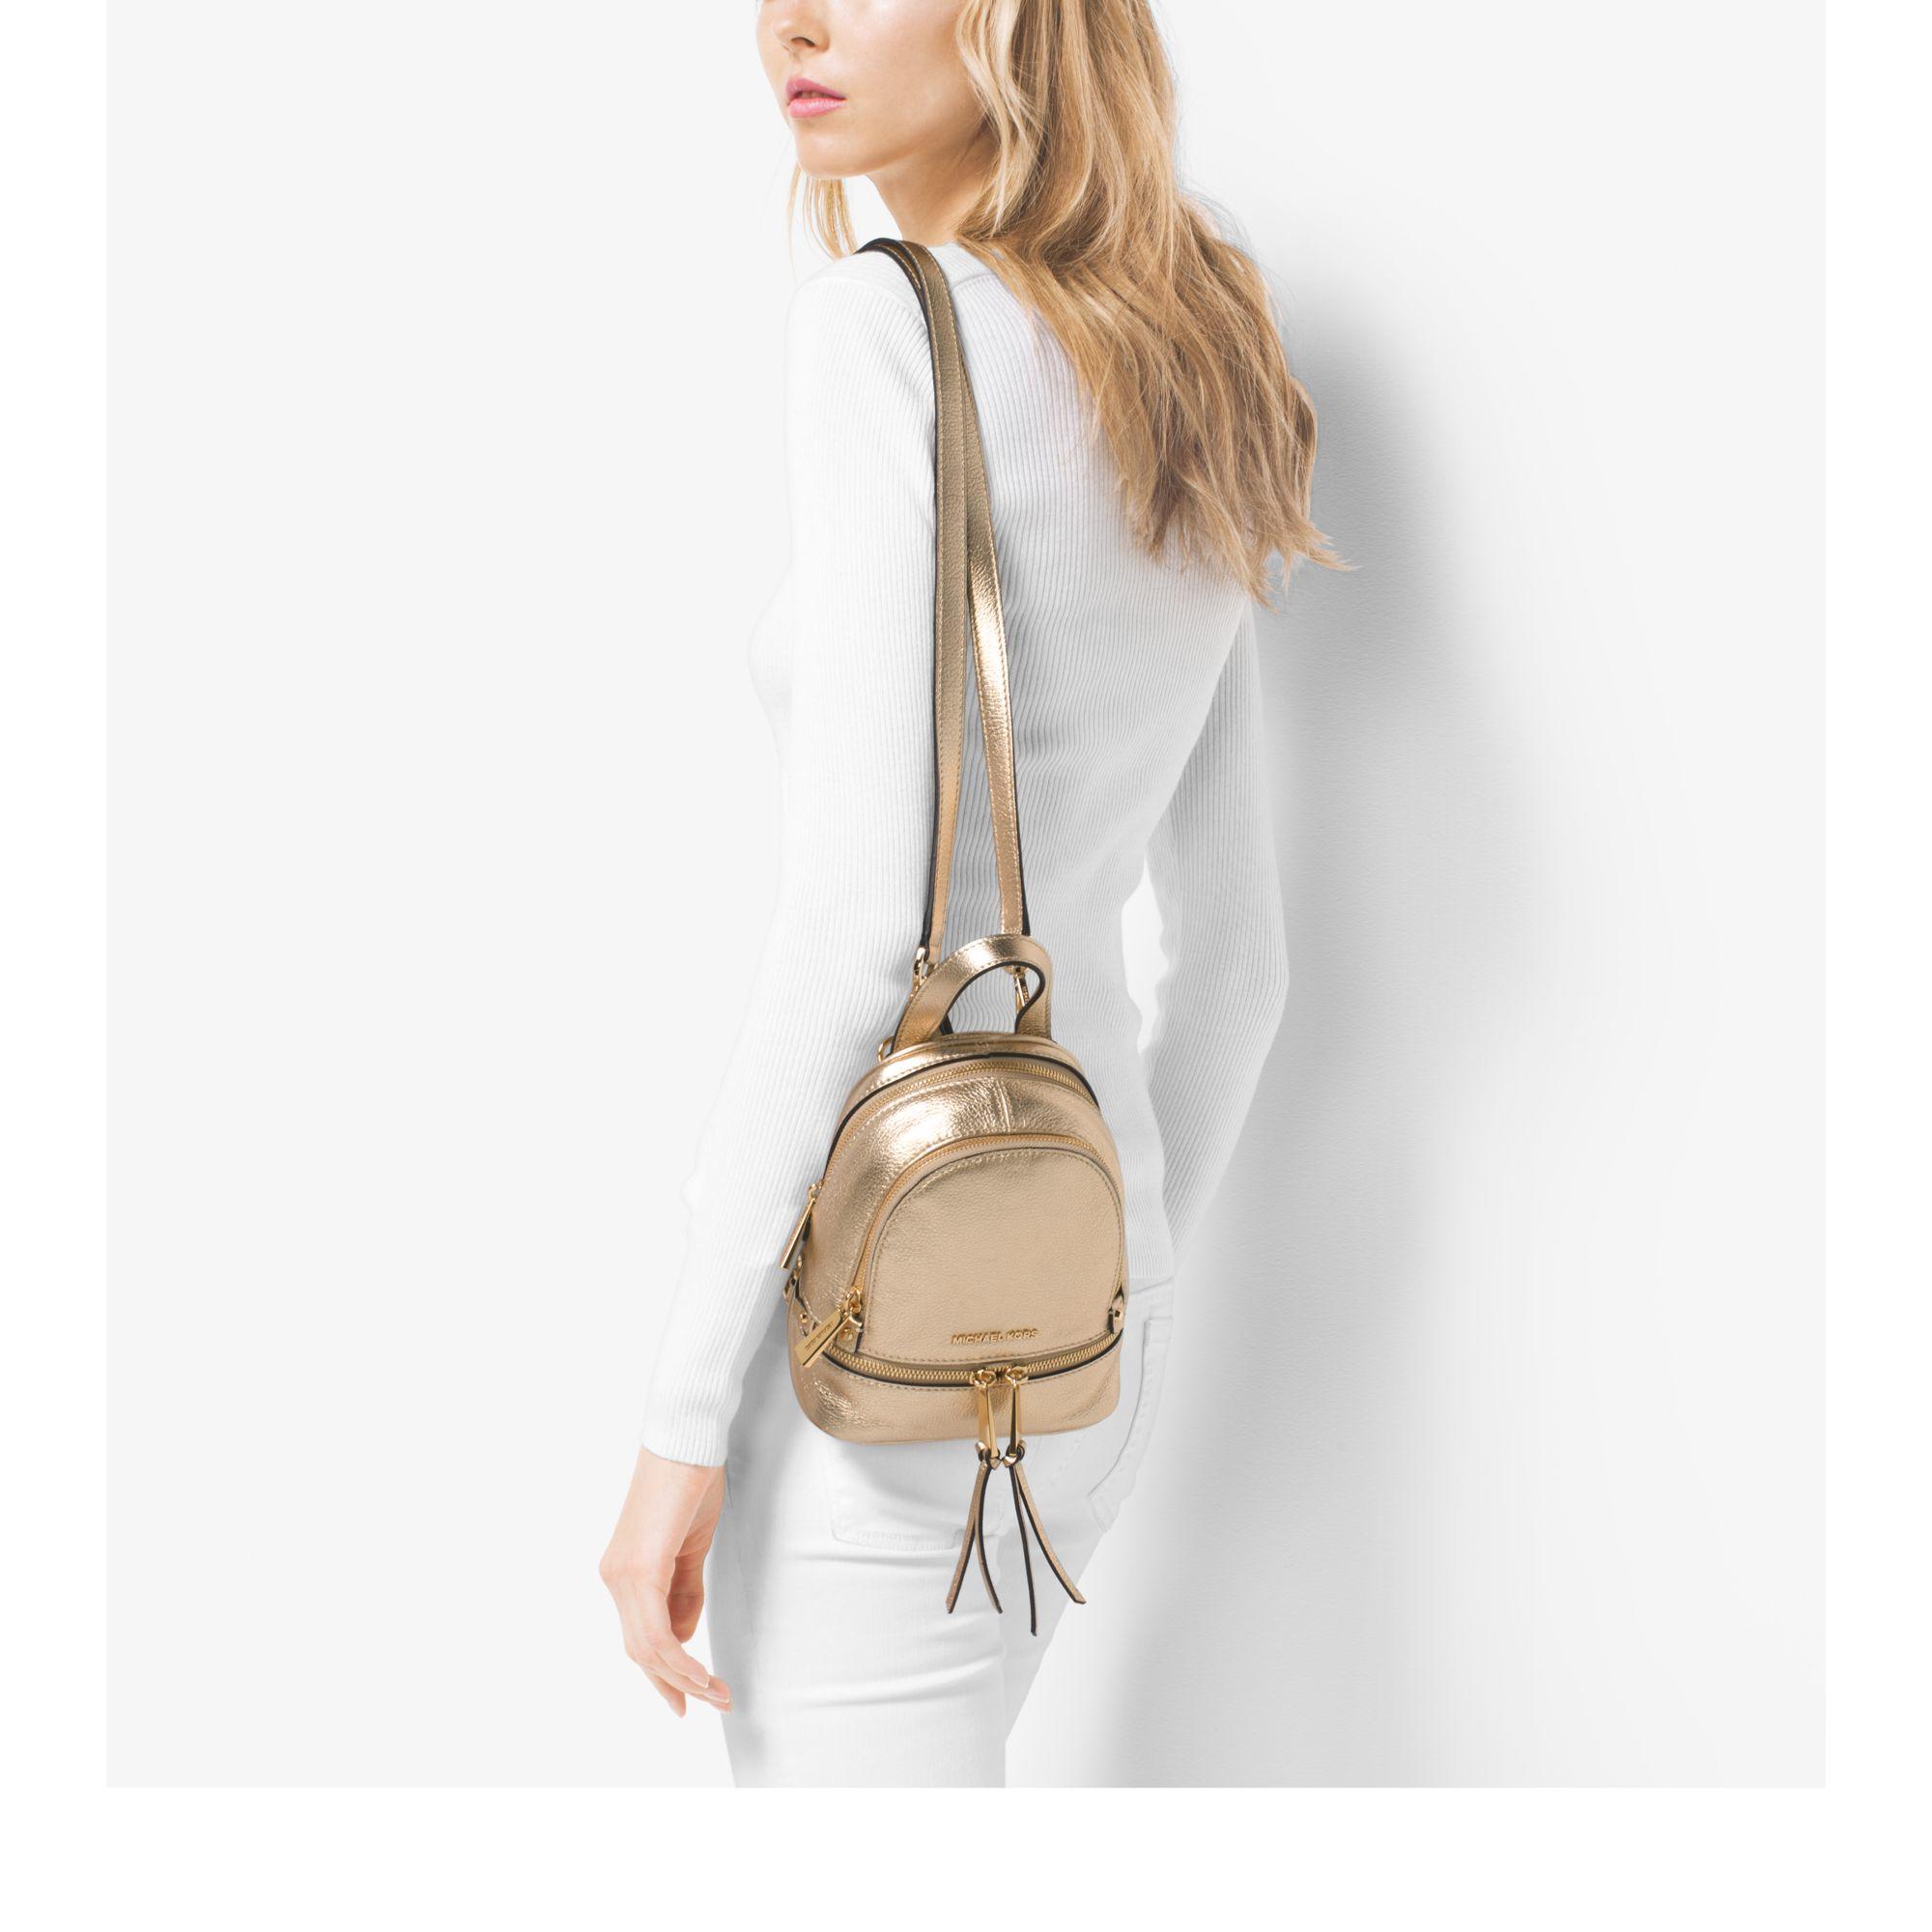 9942cd192cd80 Michael Kors Rhea Extra-small Metallic Leather Backpack